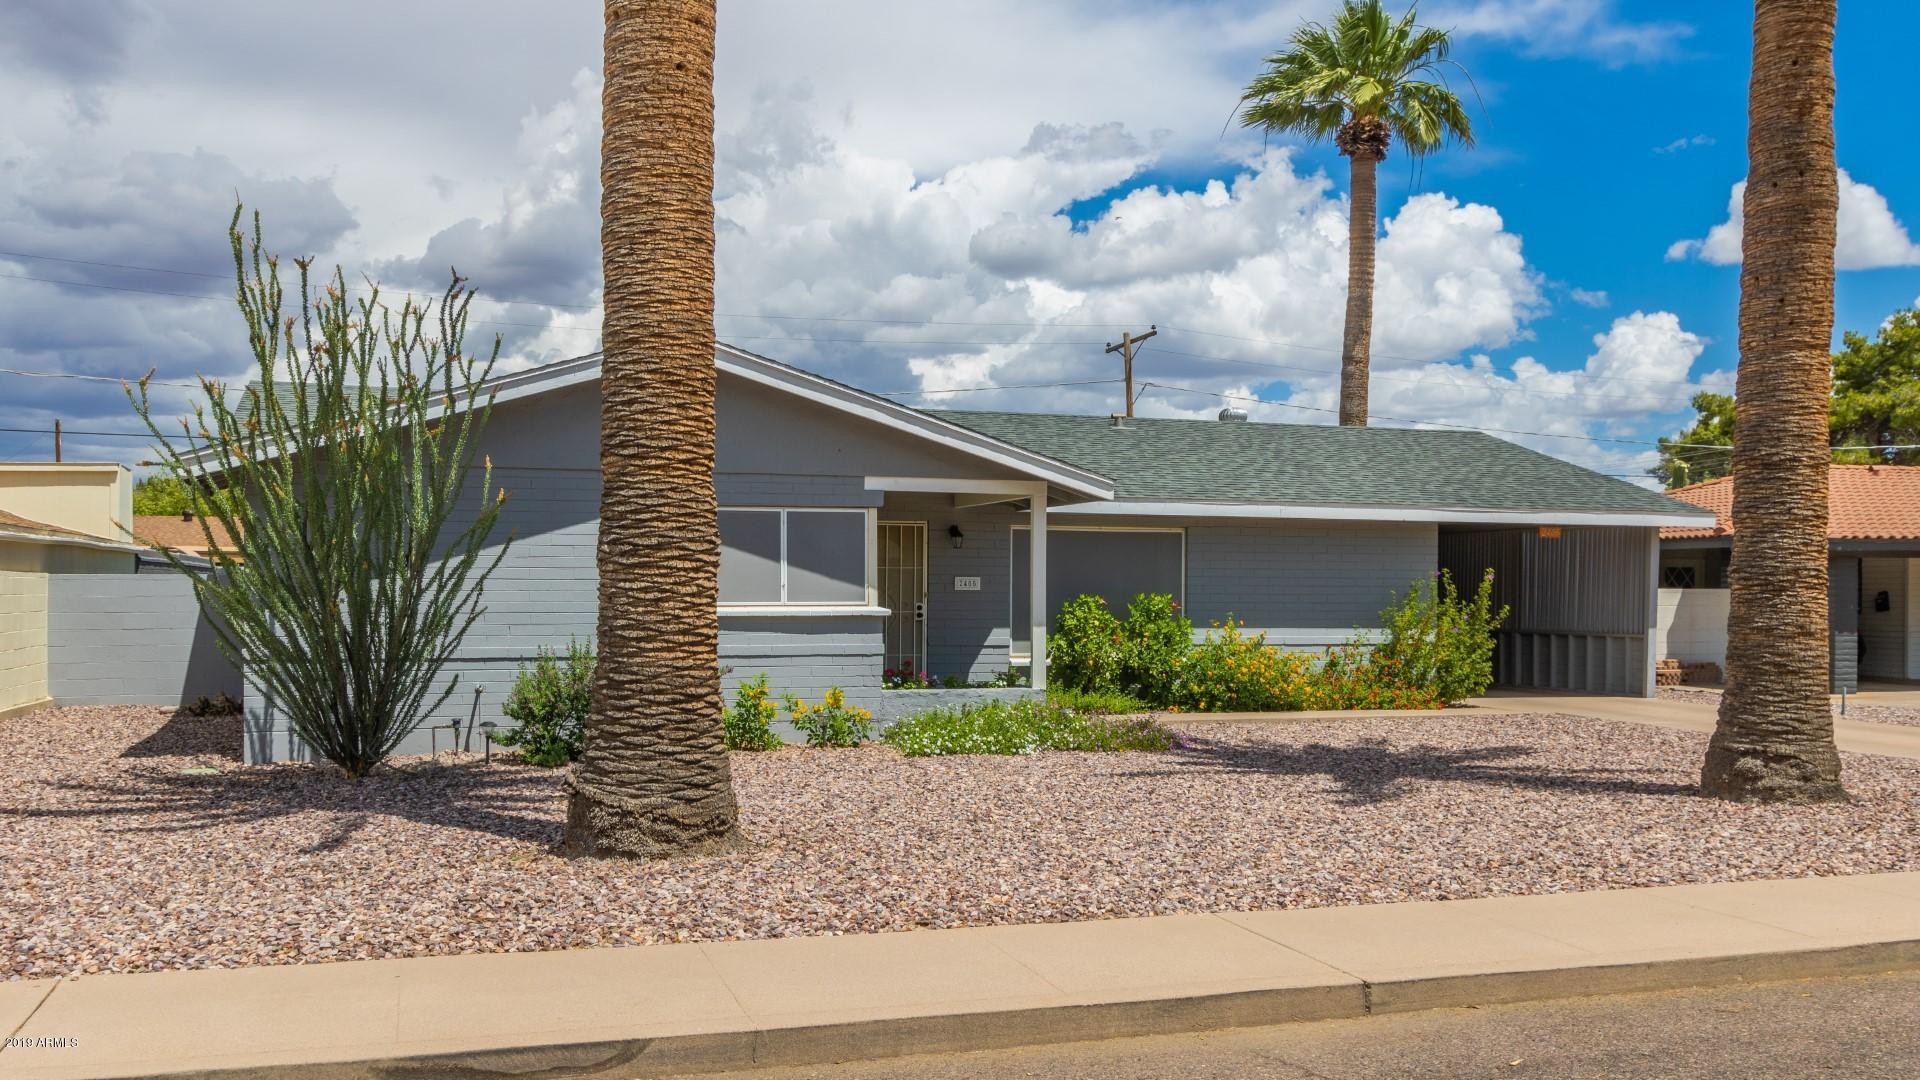 Photo for 2405 N 39th Street, Phoenix, AZ 85008 (MLS # 5938712)